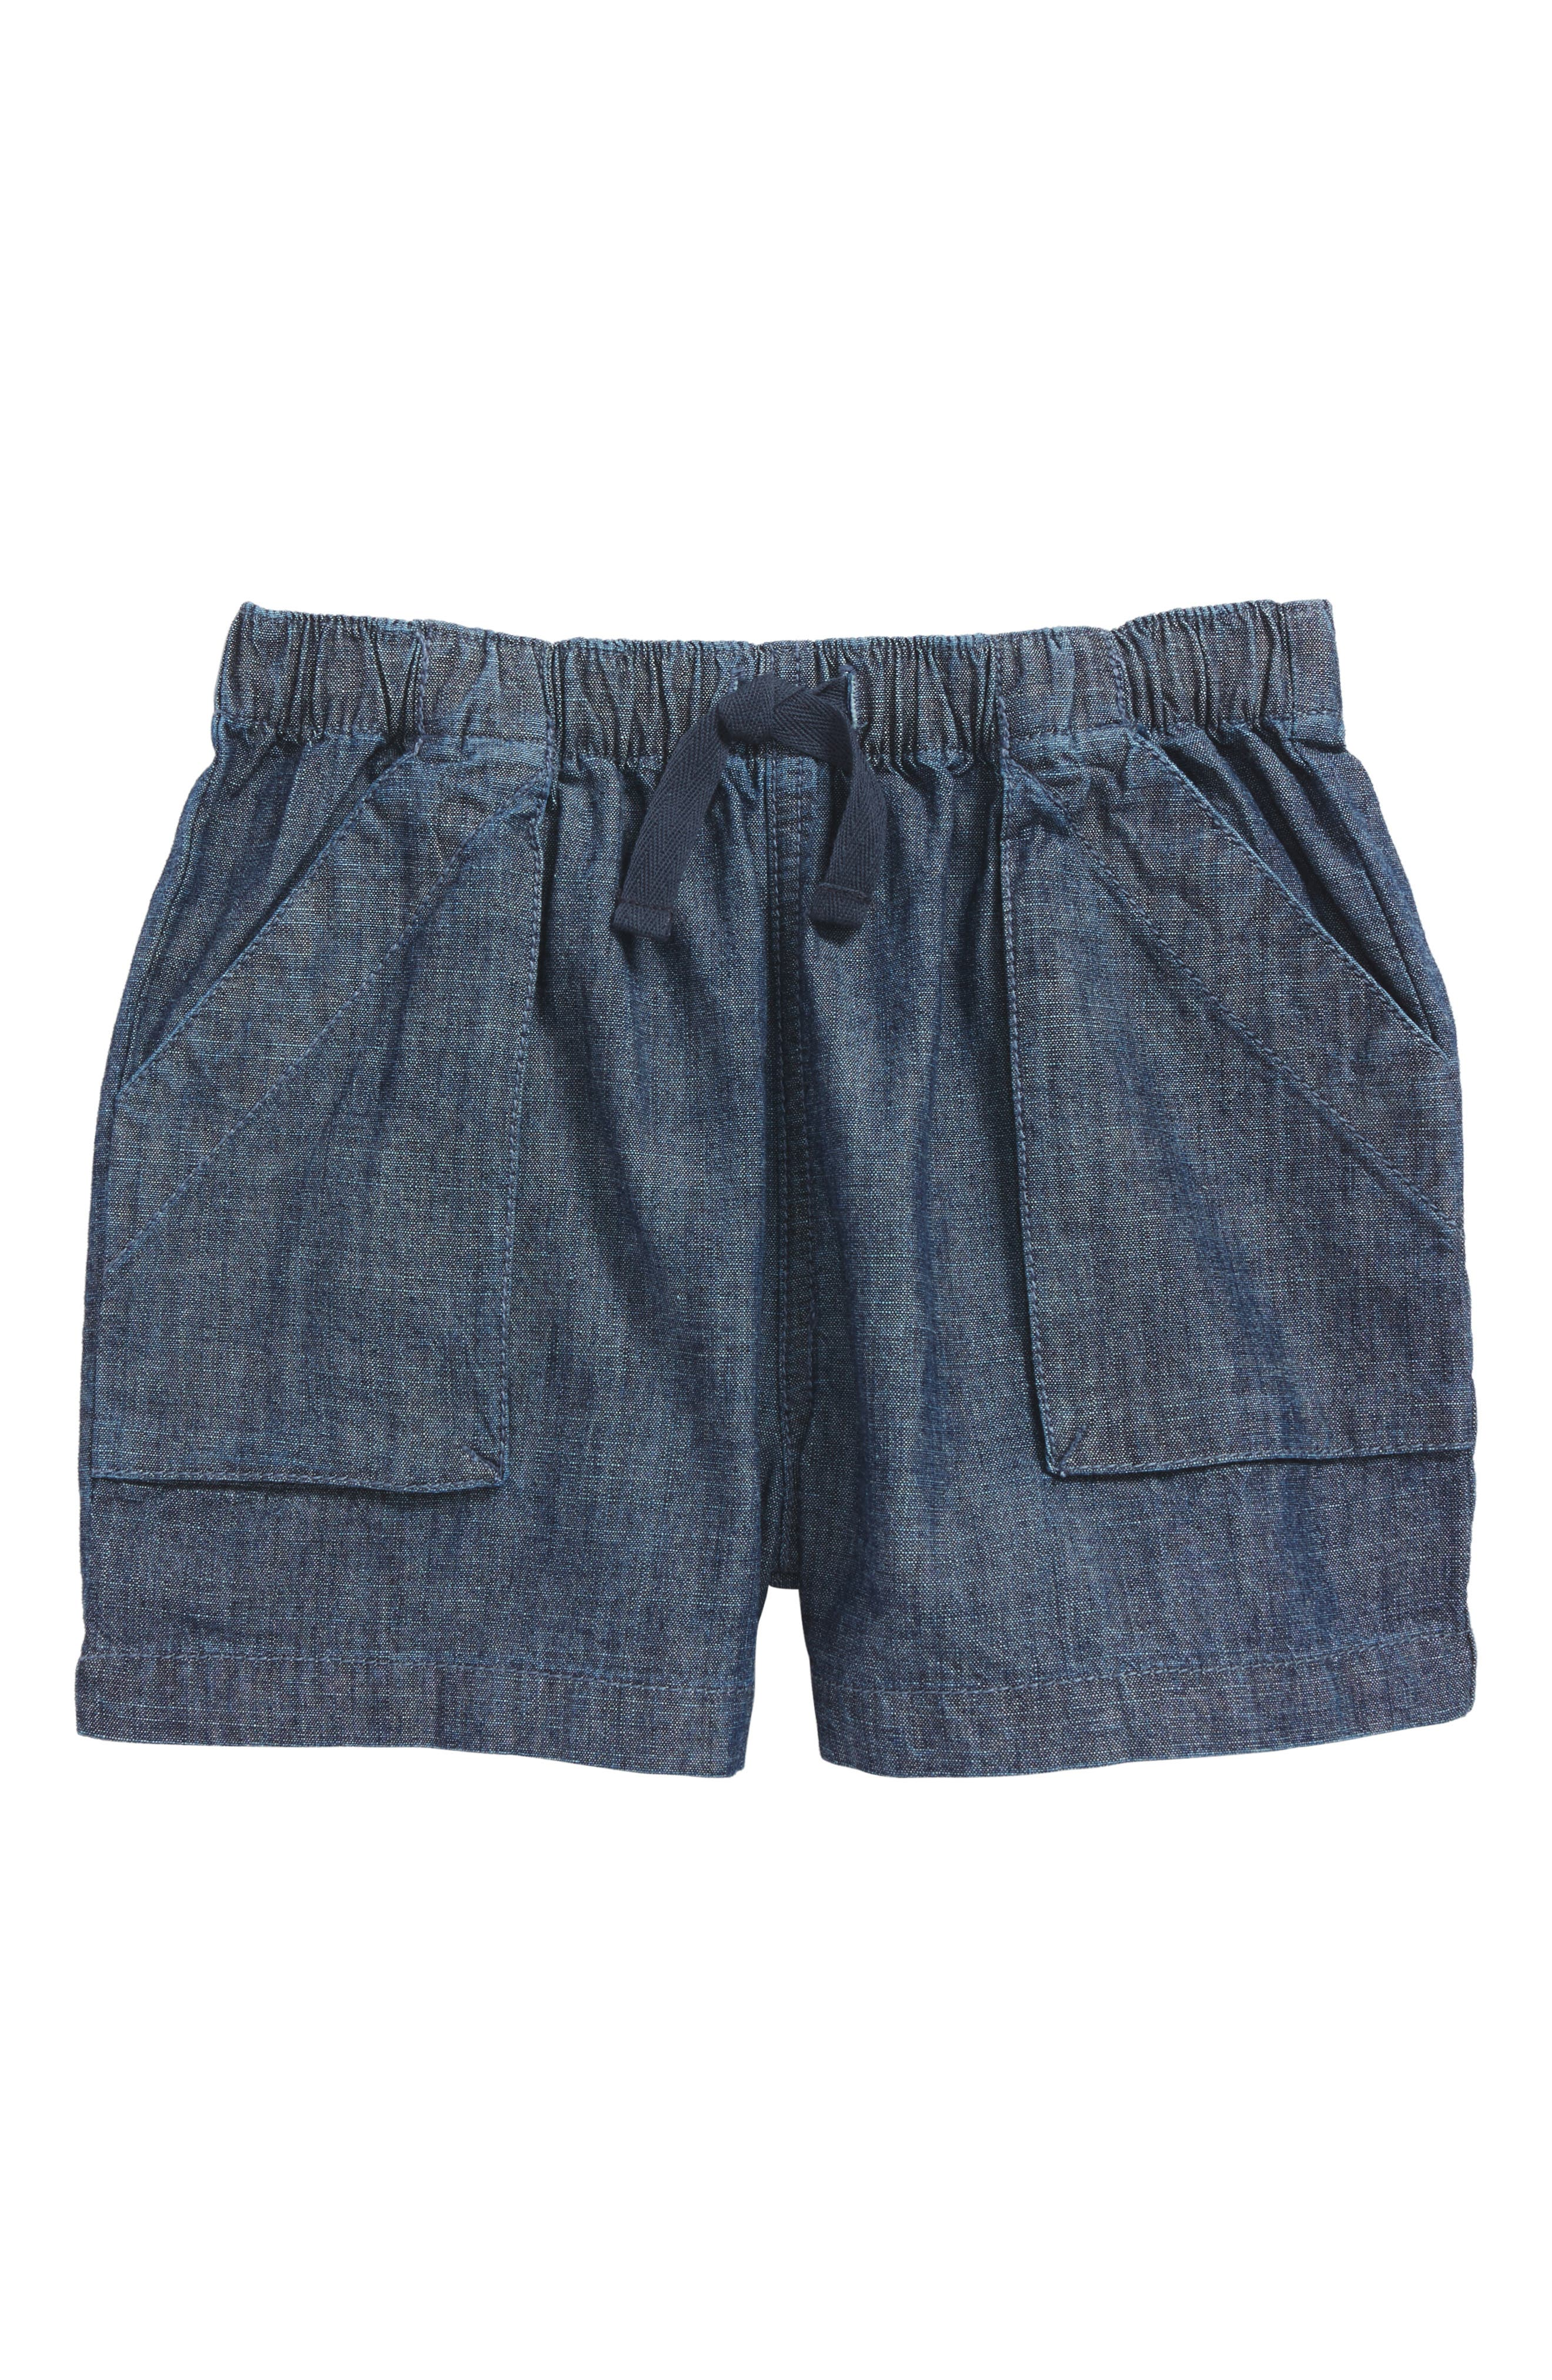 Tea Collection Chambray Shorts (Toddler Girls, Little Girls & Big Girls)